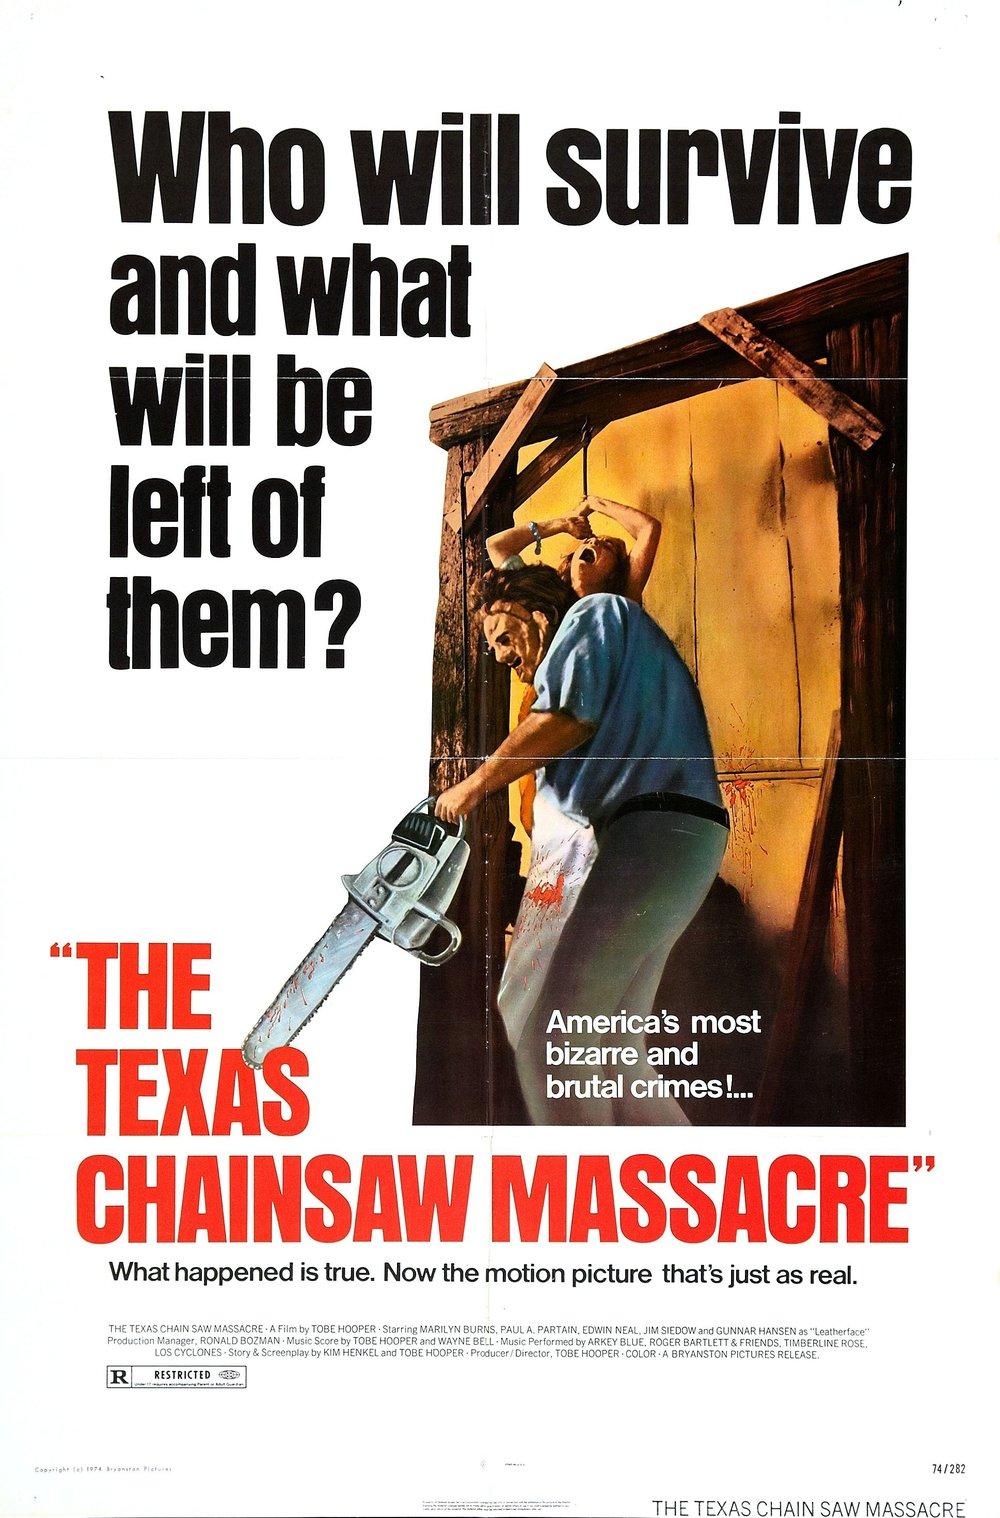 texas_chainsaw_massacre_1_poster_01.jpg